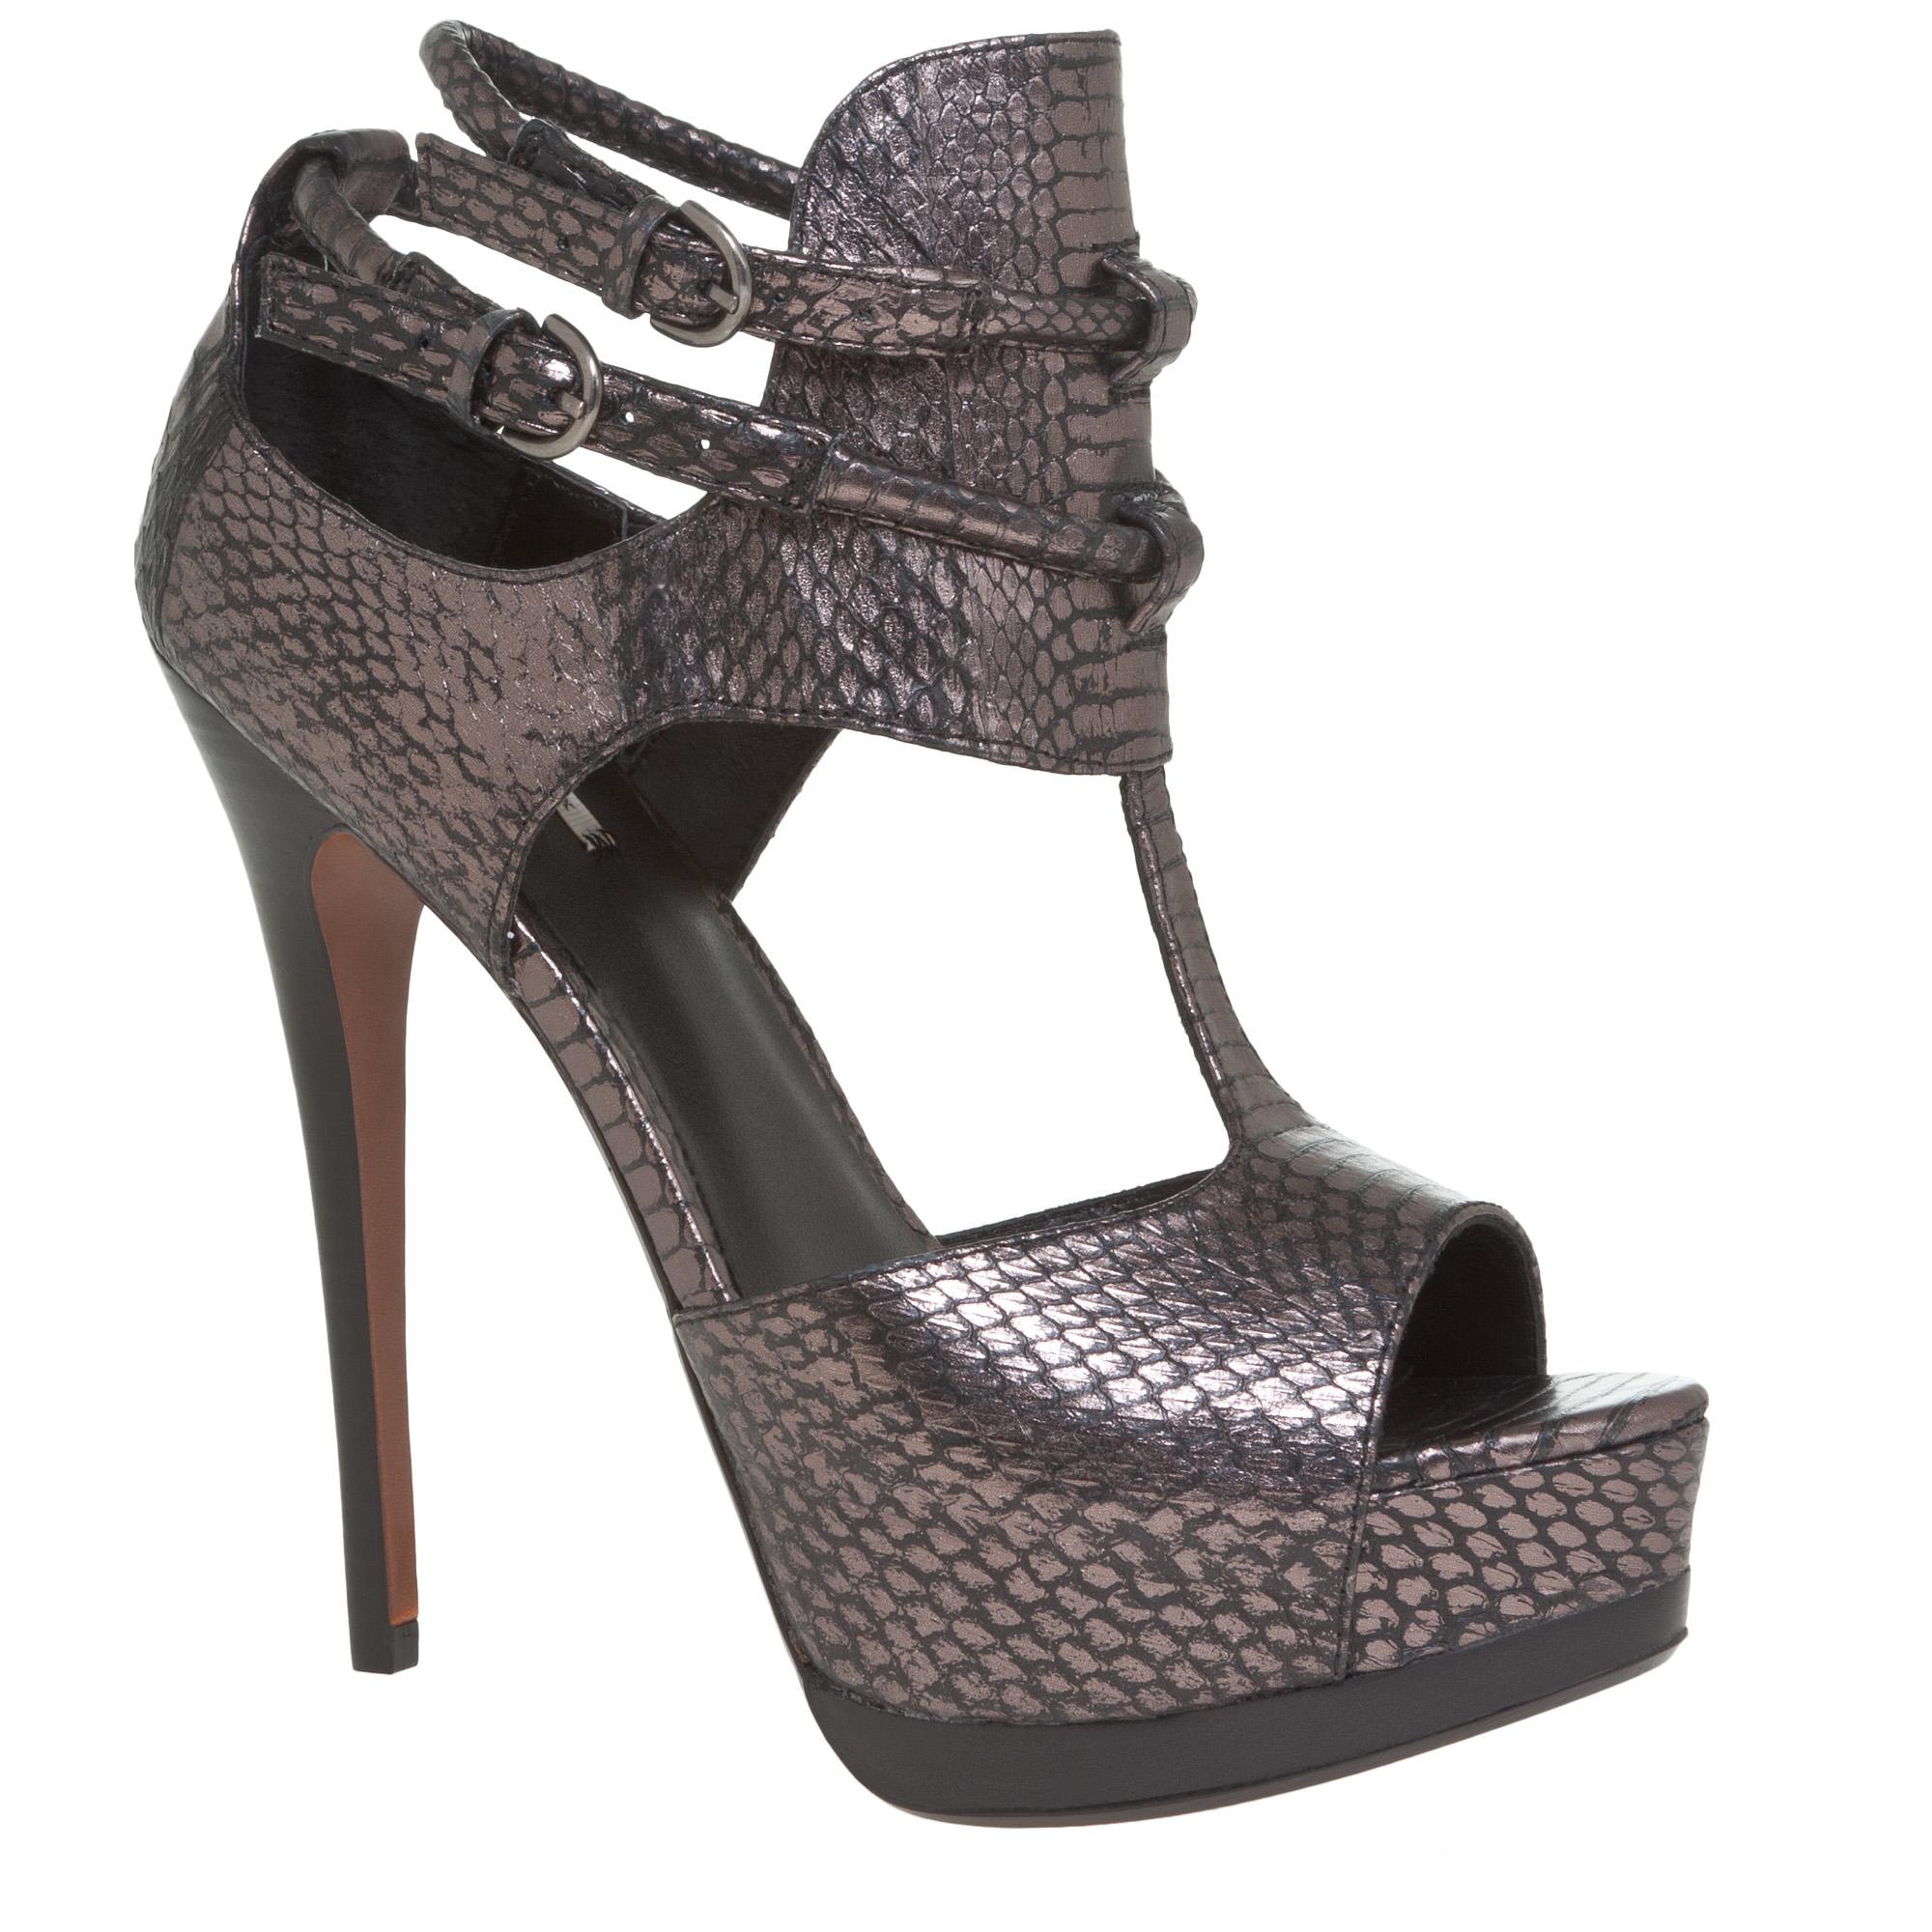 Leon max Bugsy - Double Platform High-heels in Metallic | Lyst